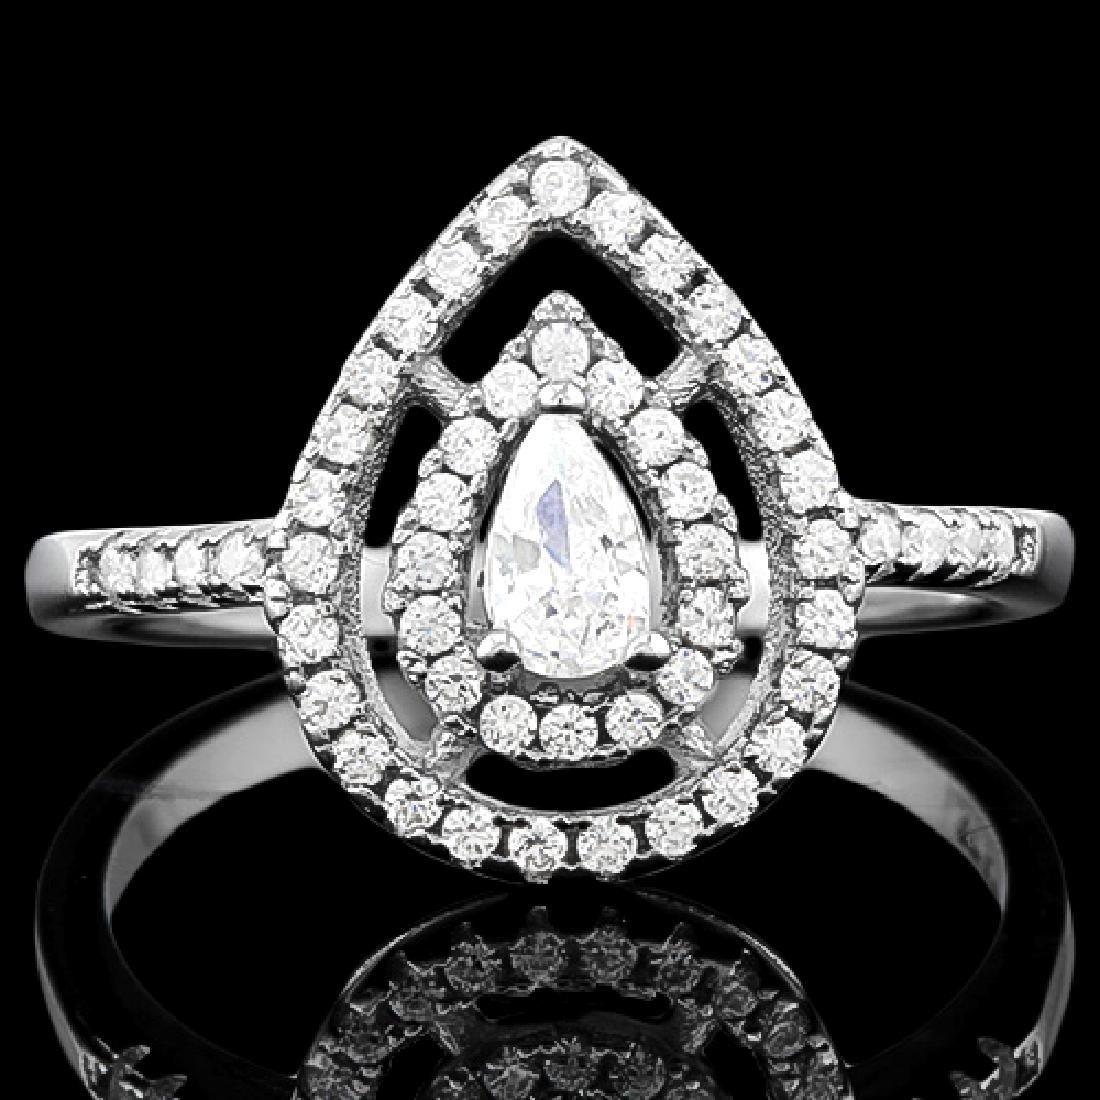 0.30 CT CREATED DIAMOND & 53PCS CREATED DIAMOND 925 STE